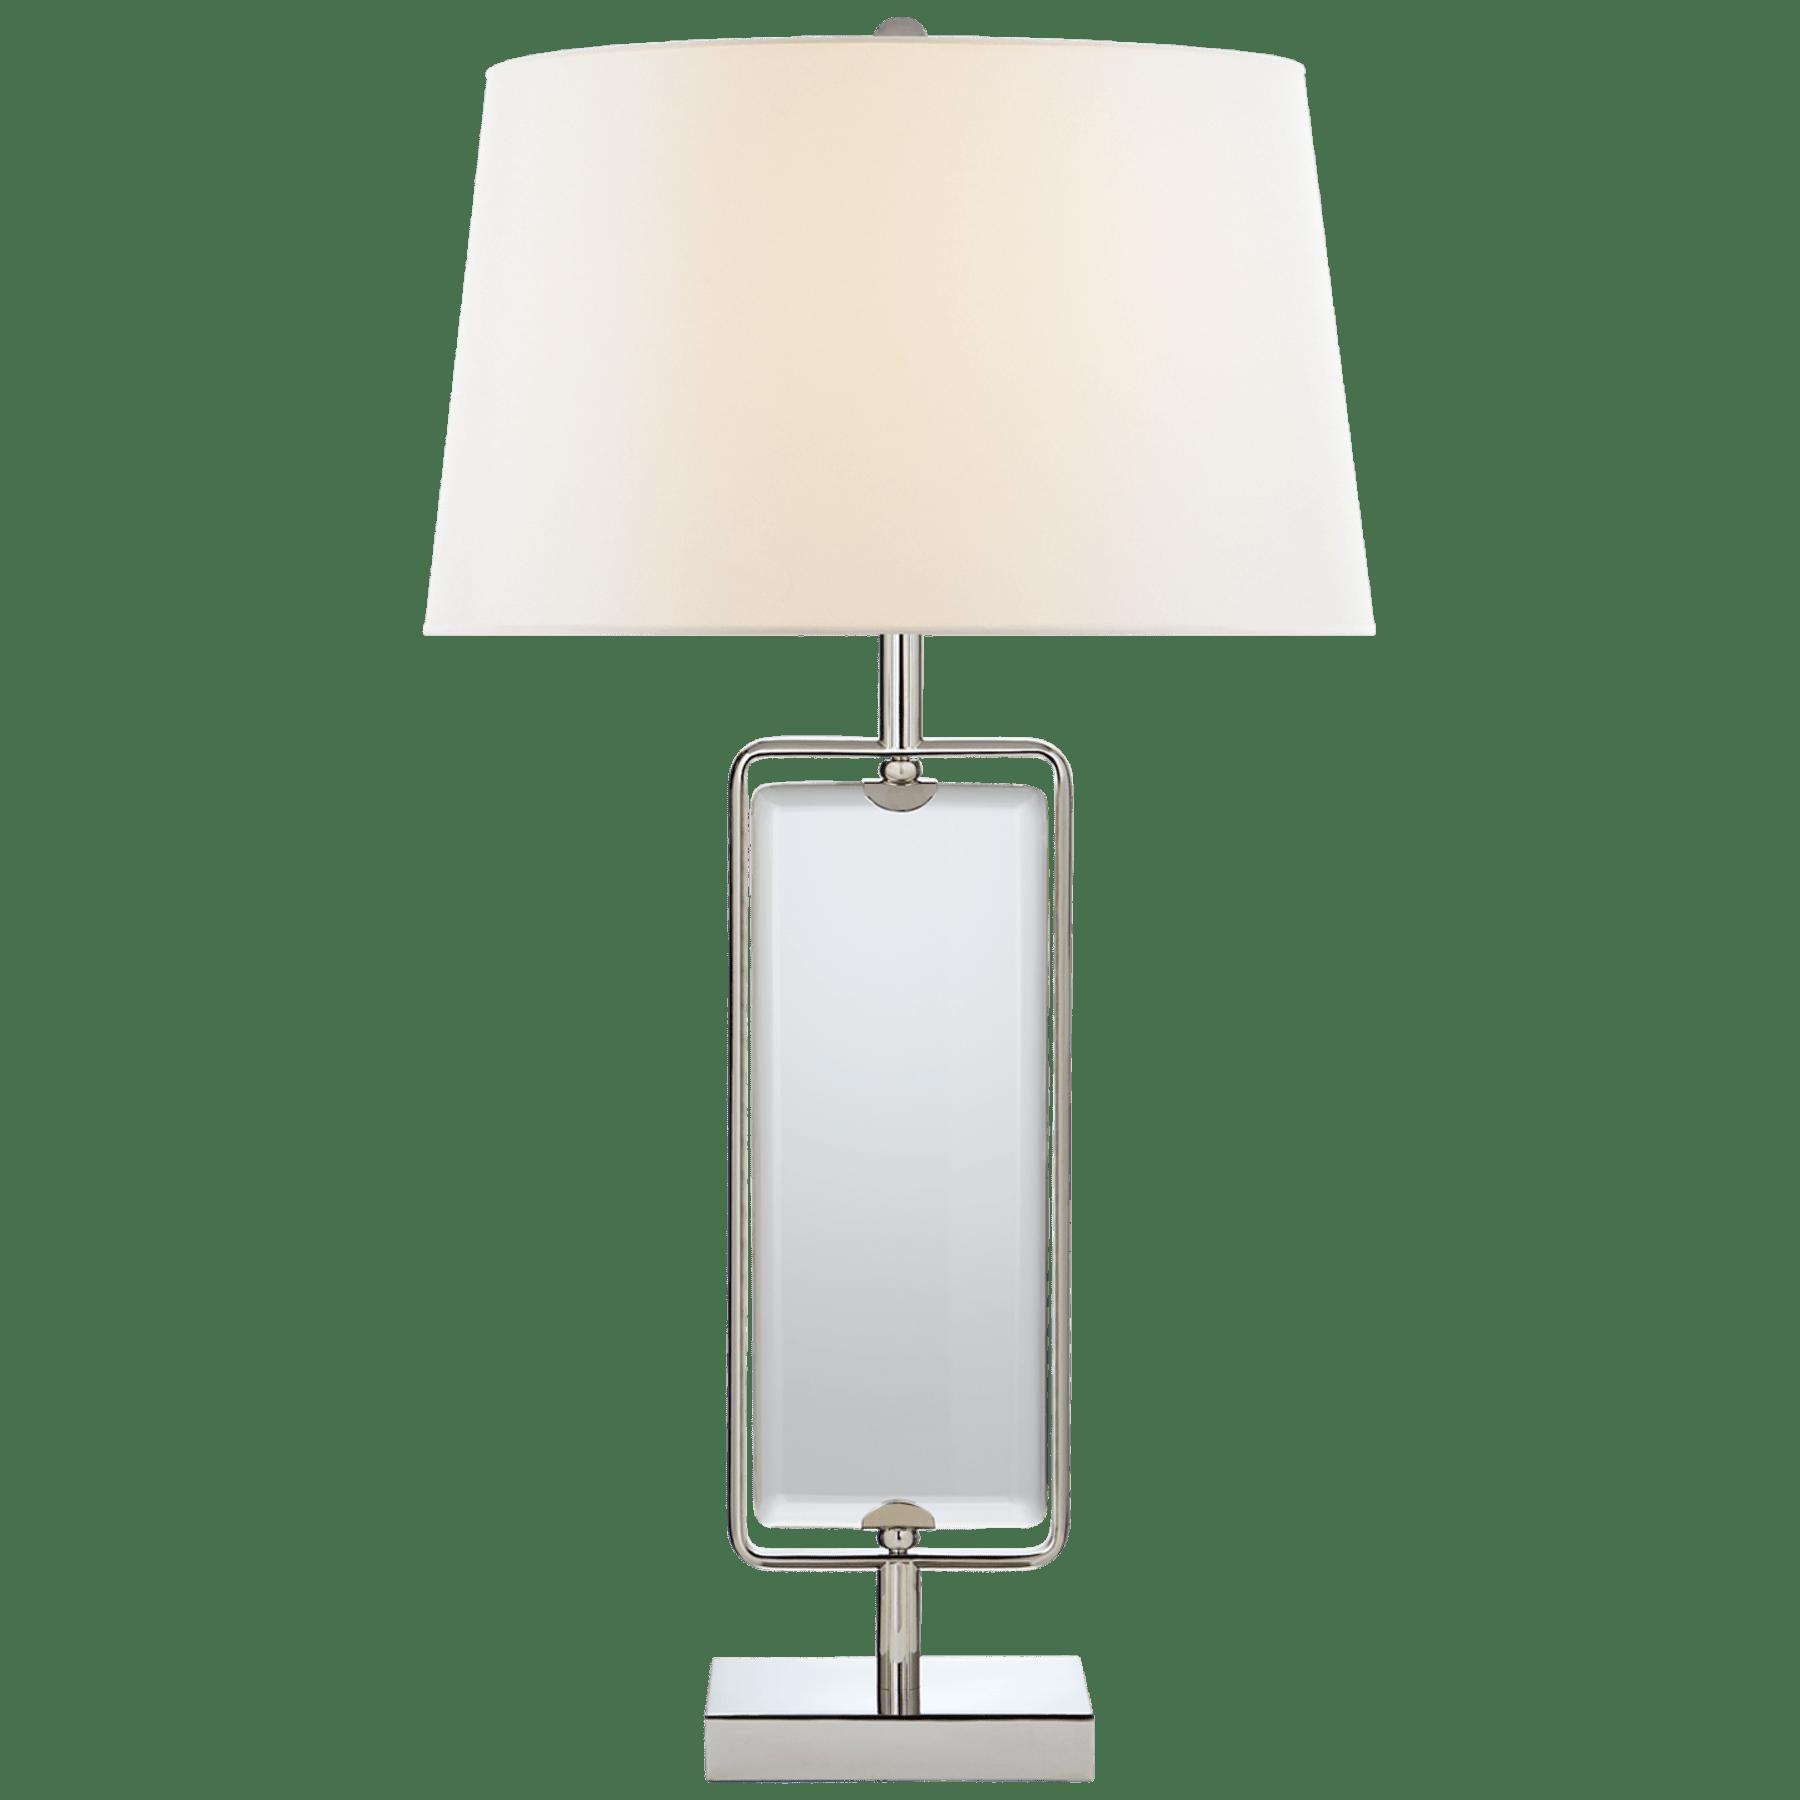 Henri Large Framed Table Lamp Lamp Decorative Table Lamps Table Lamp